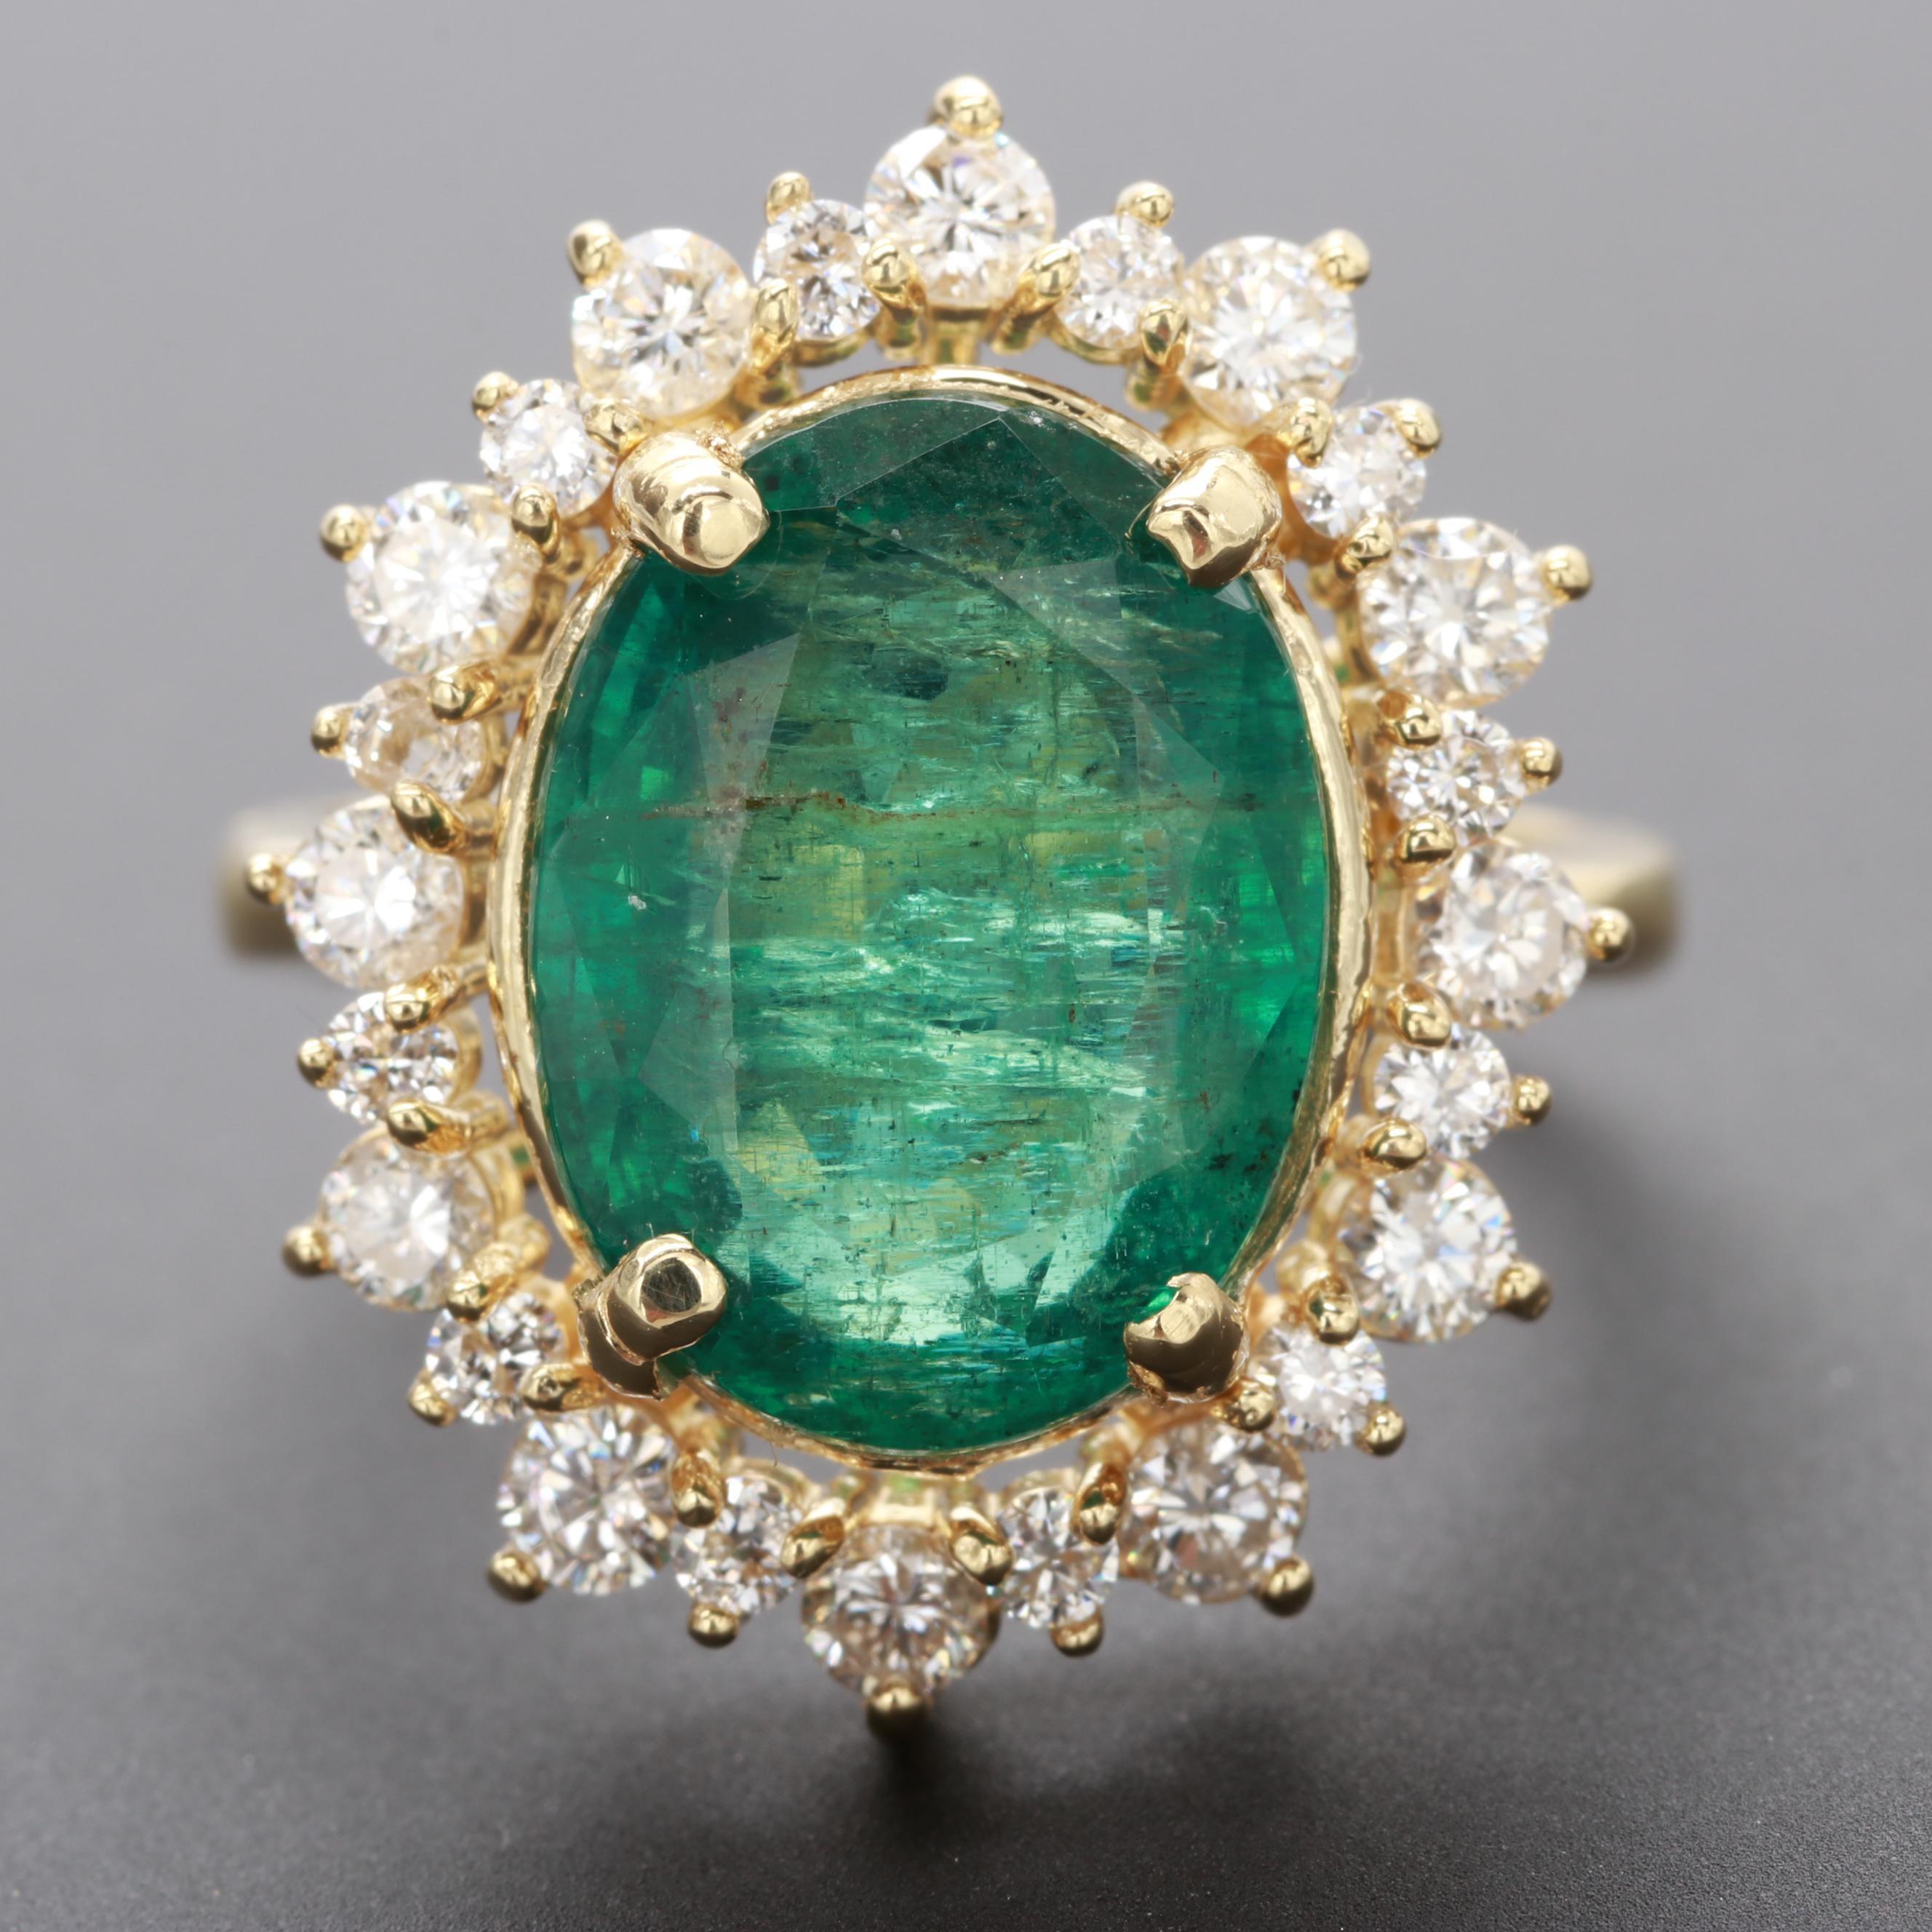 18K Yellow Gold 4.08 CT Emerald and Diamond Ring